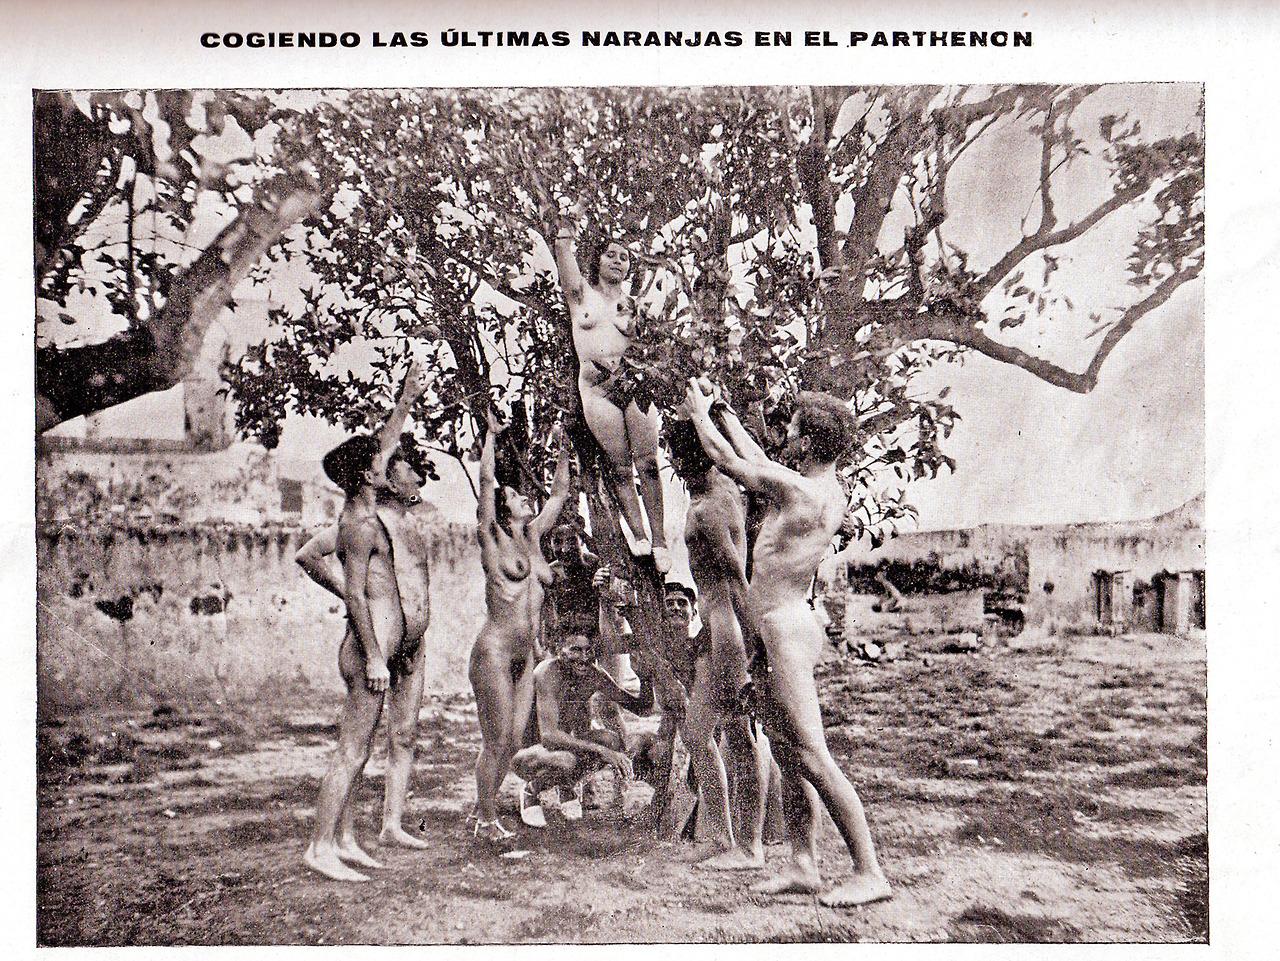 https://www.nudismlife.com/galleries/nudists_and_nude/the_most_natural_nudists/the_most_natural_nudists_0004.jpg